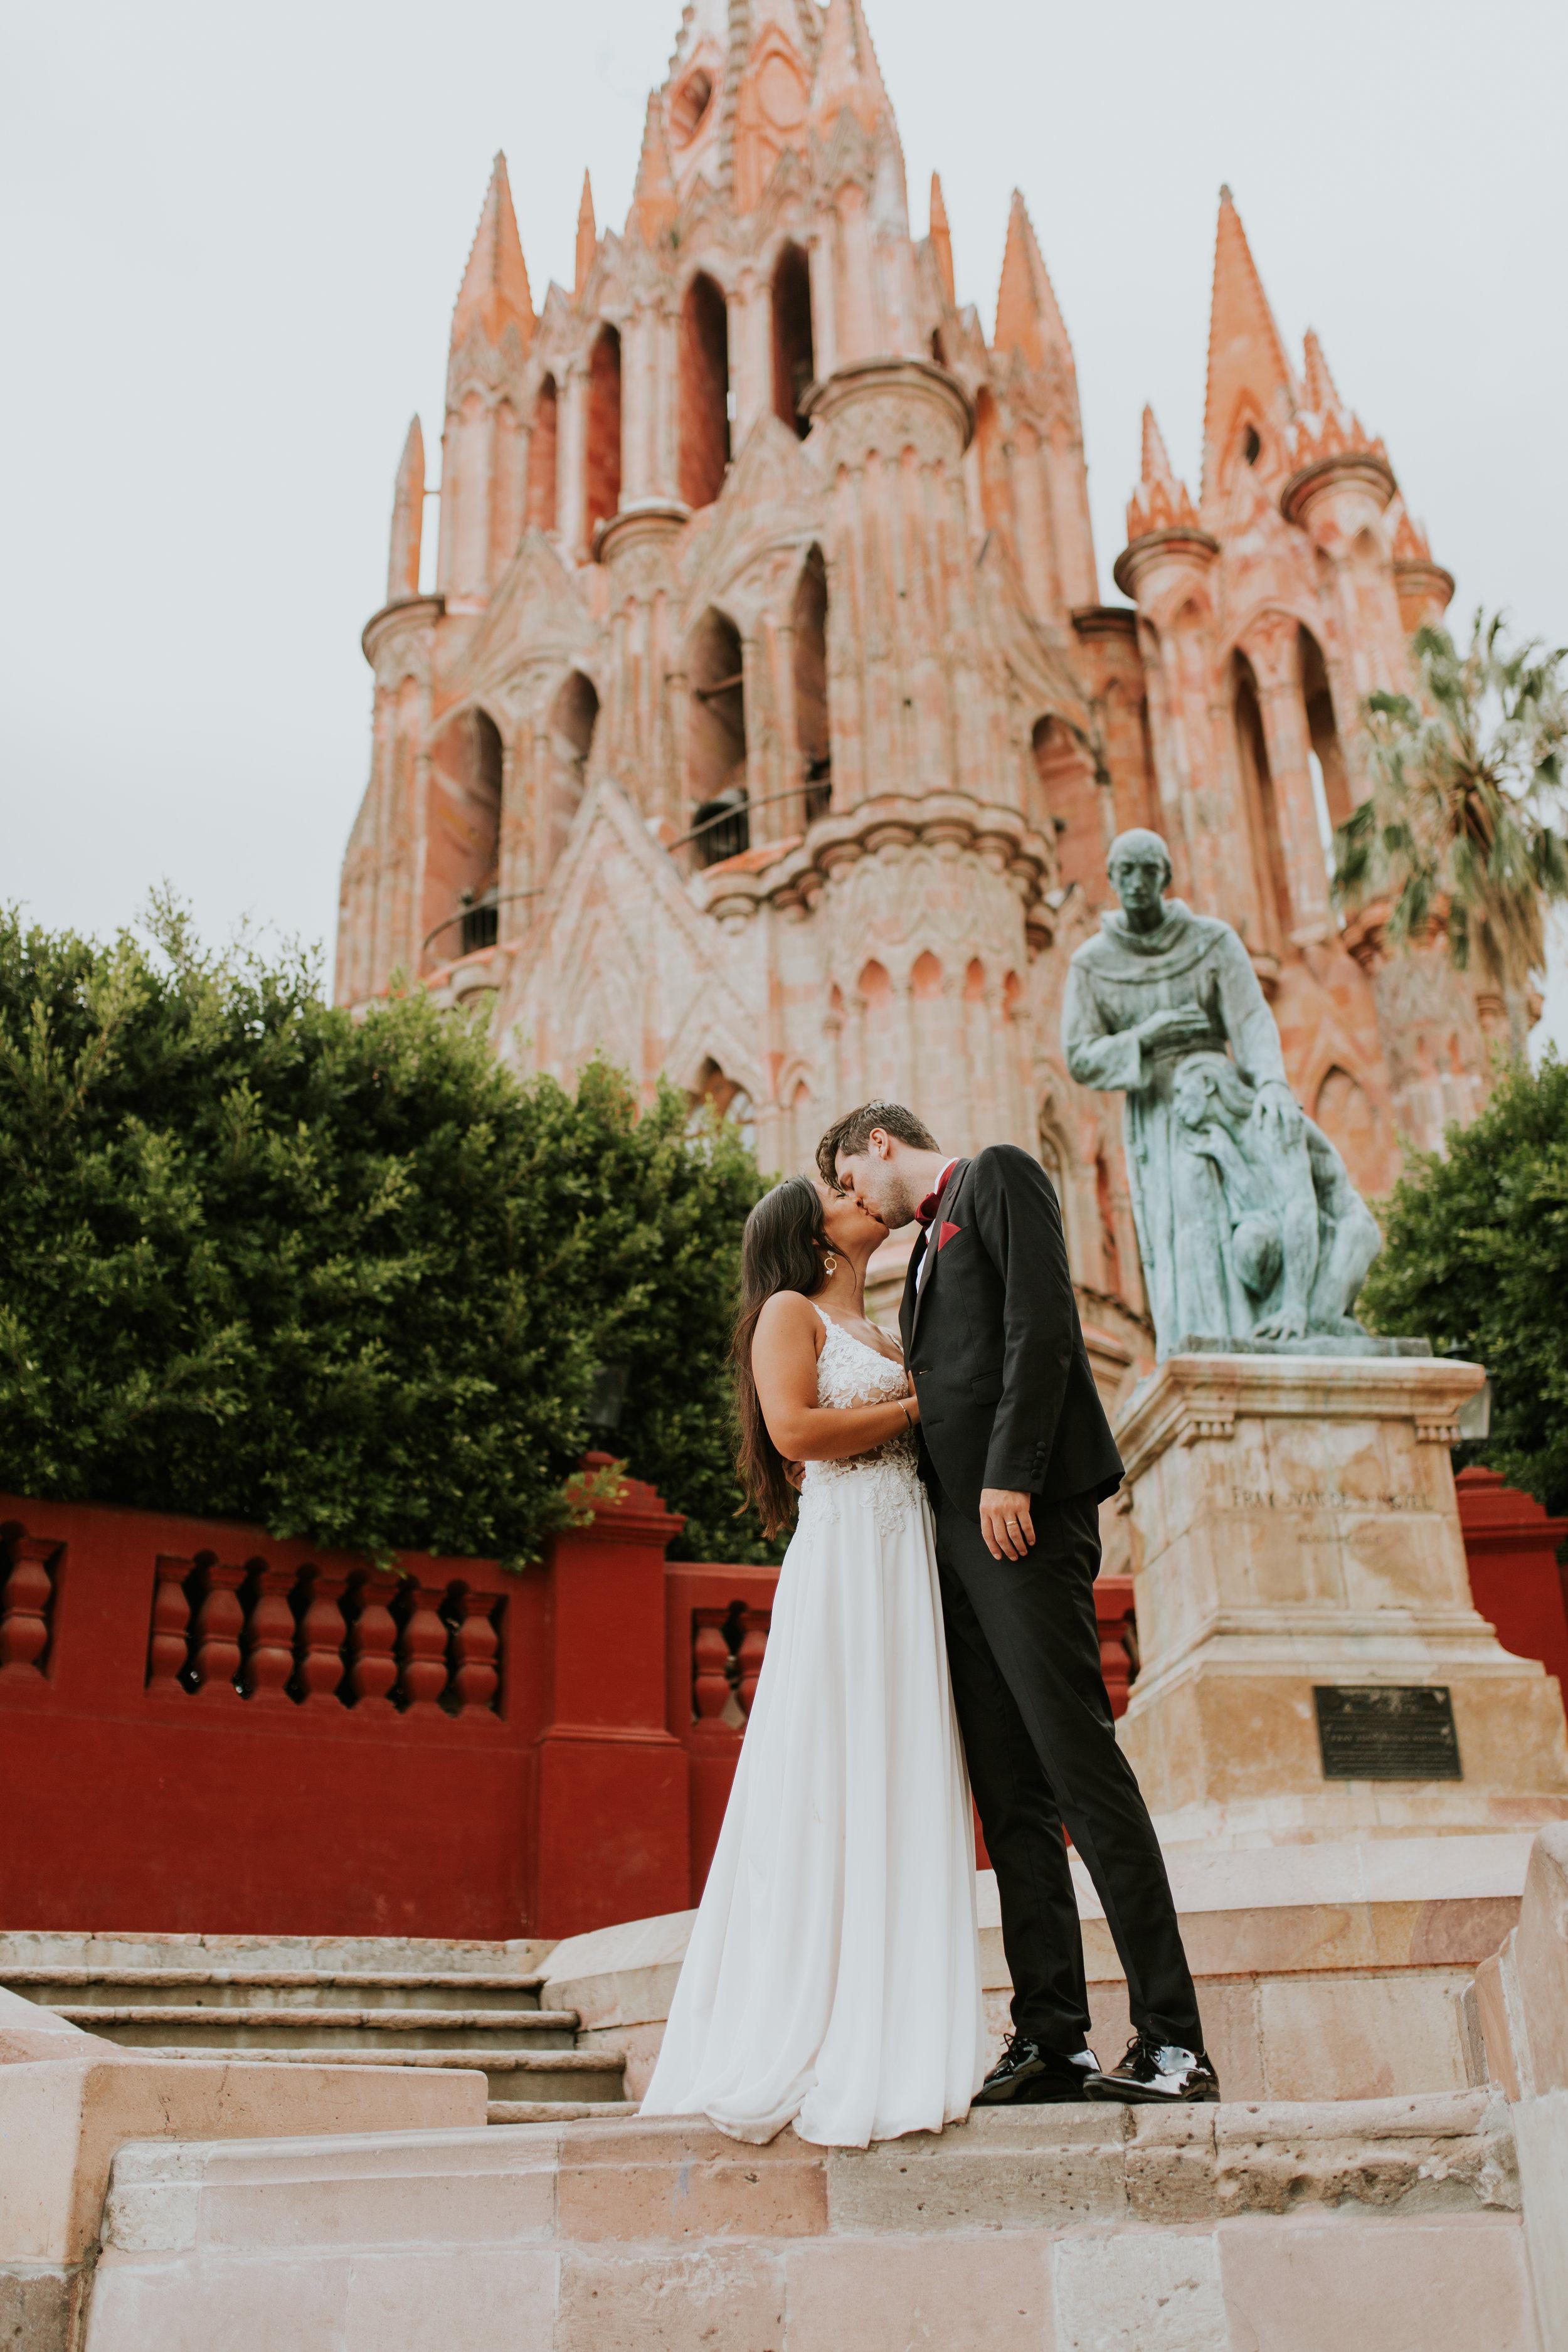 Sofia + Shane  ↠  Destination Wedding  San Miguel De Allende, Mexico